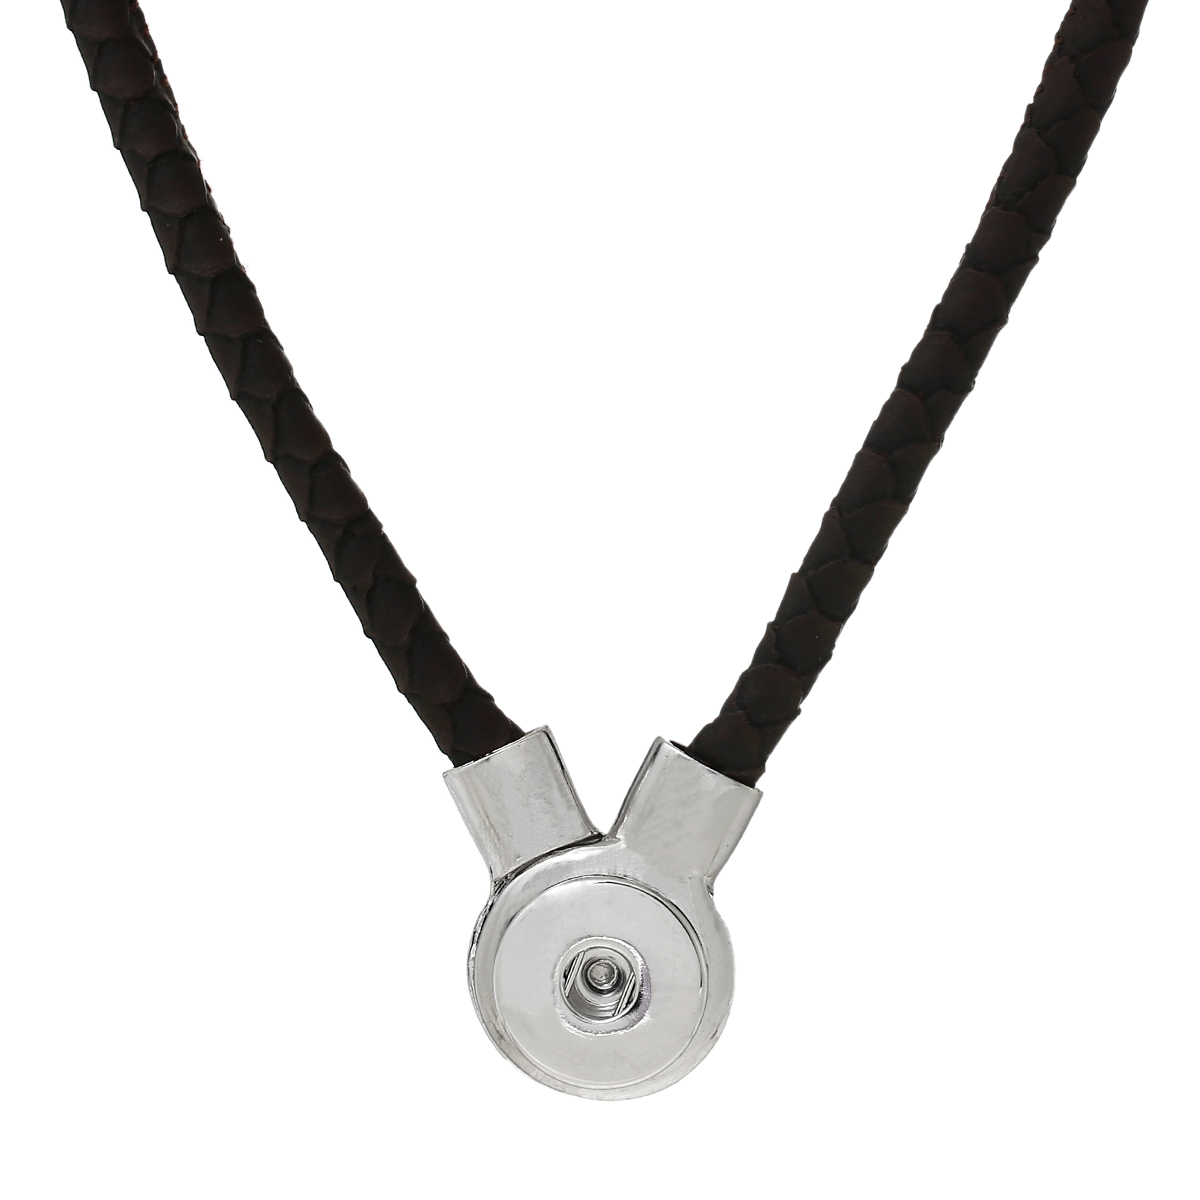 "DoreenBeads PU Fashion Snap Jewelry Necklace Coffee Silver Tone 50cm x2.3cm(<font><b>19</b></font> 5/<font><b>8</b></font>"" <font><b>x</b></font> <font><b>7</b></font>/<font><b>8</b></font>""),Snap Charm Hole Size: 6mm,1 PC"